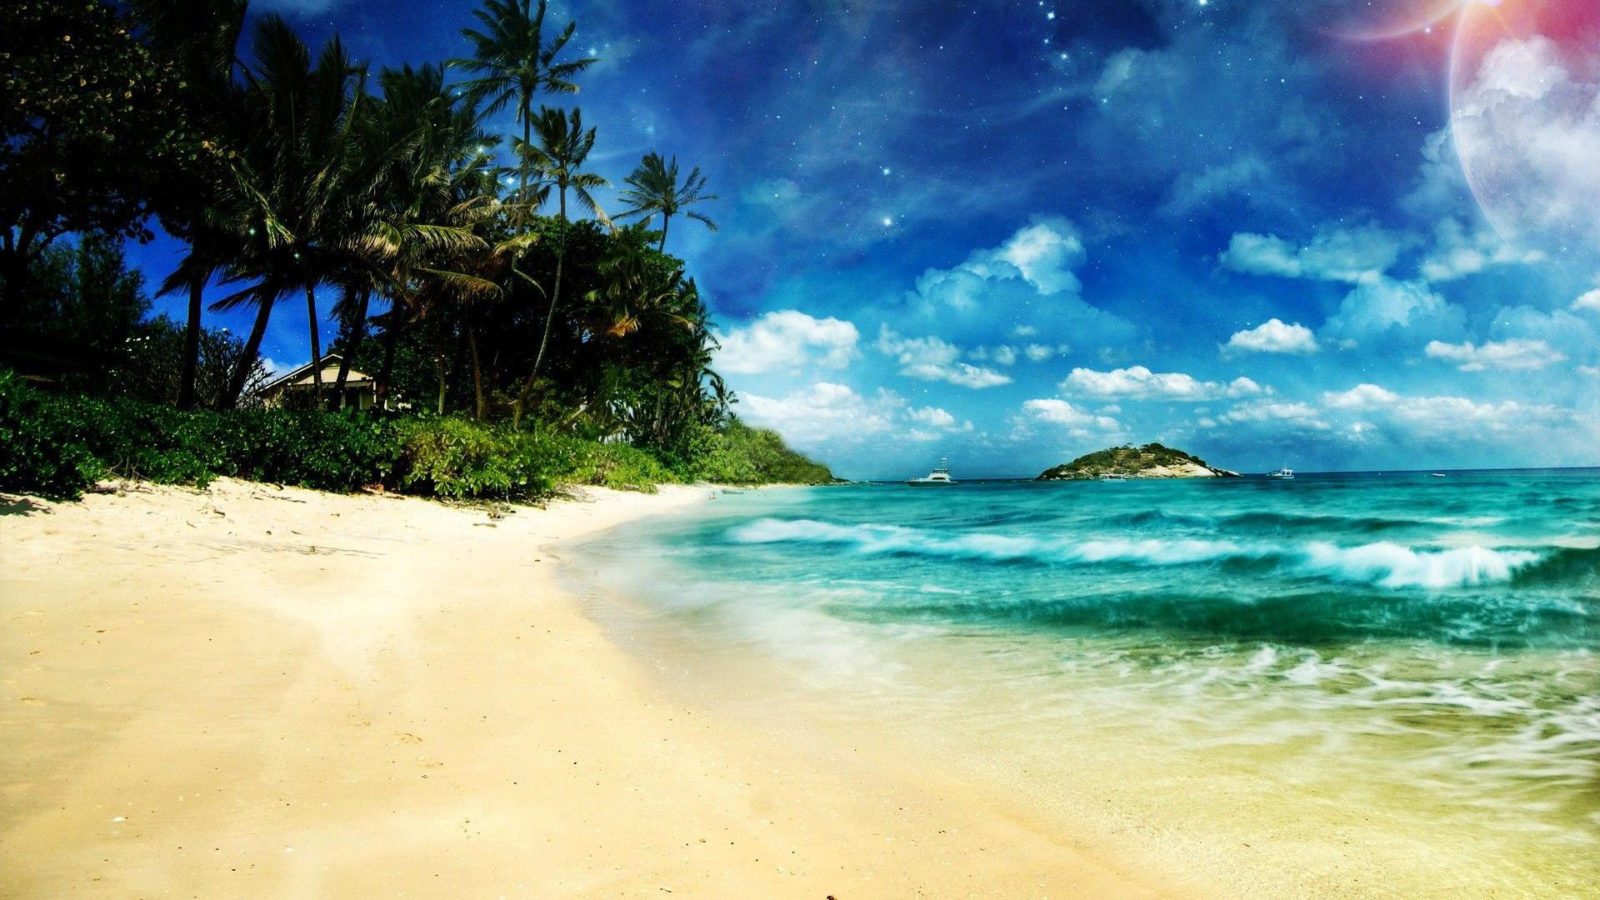 129 beach wallpaper examples